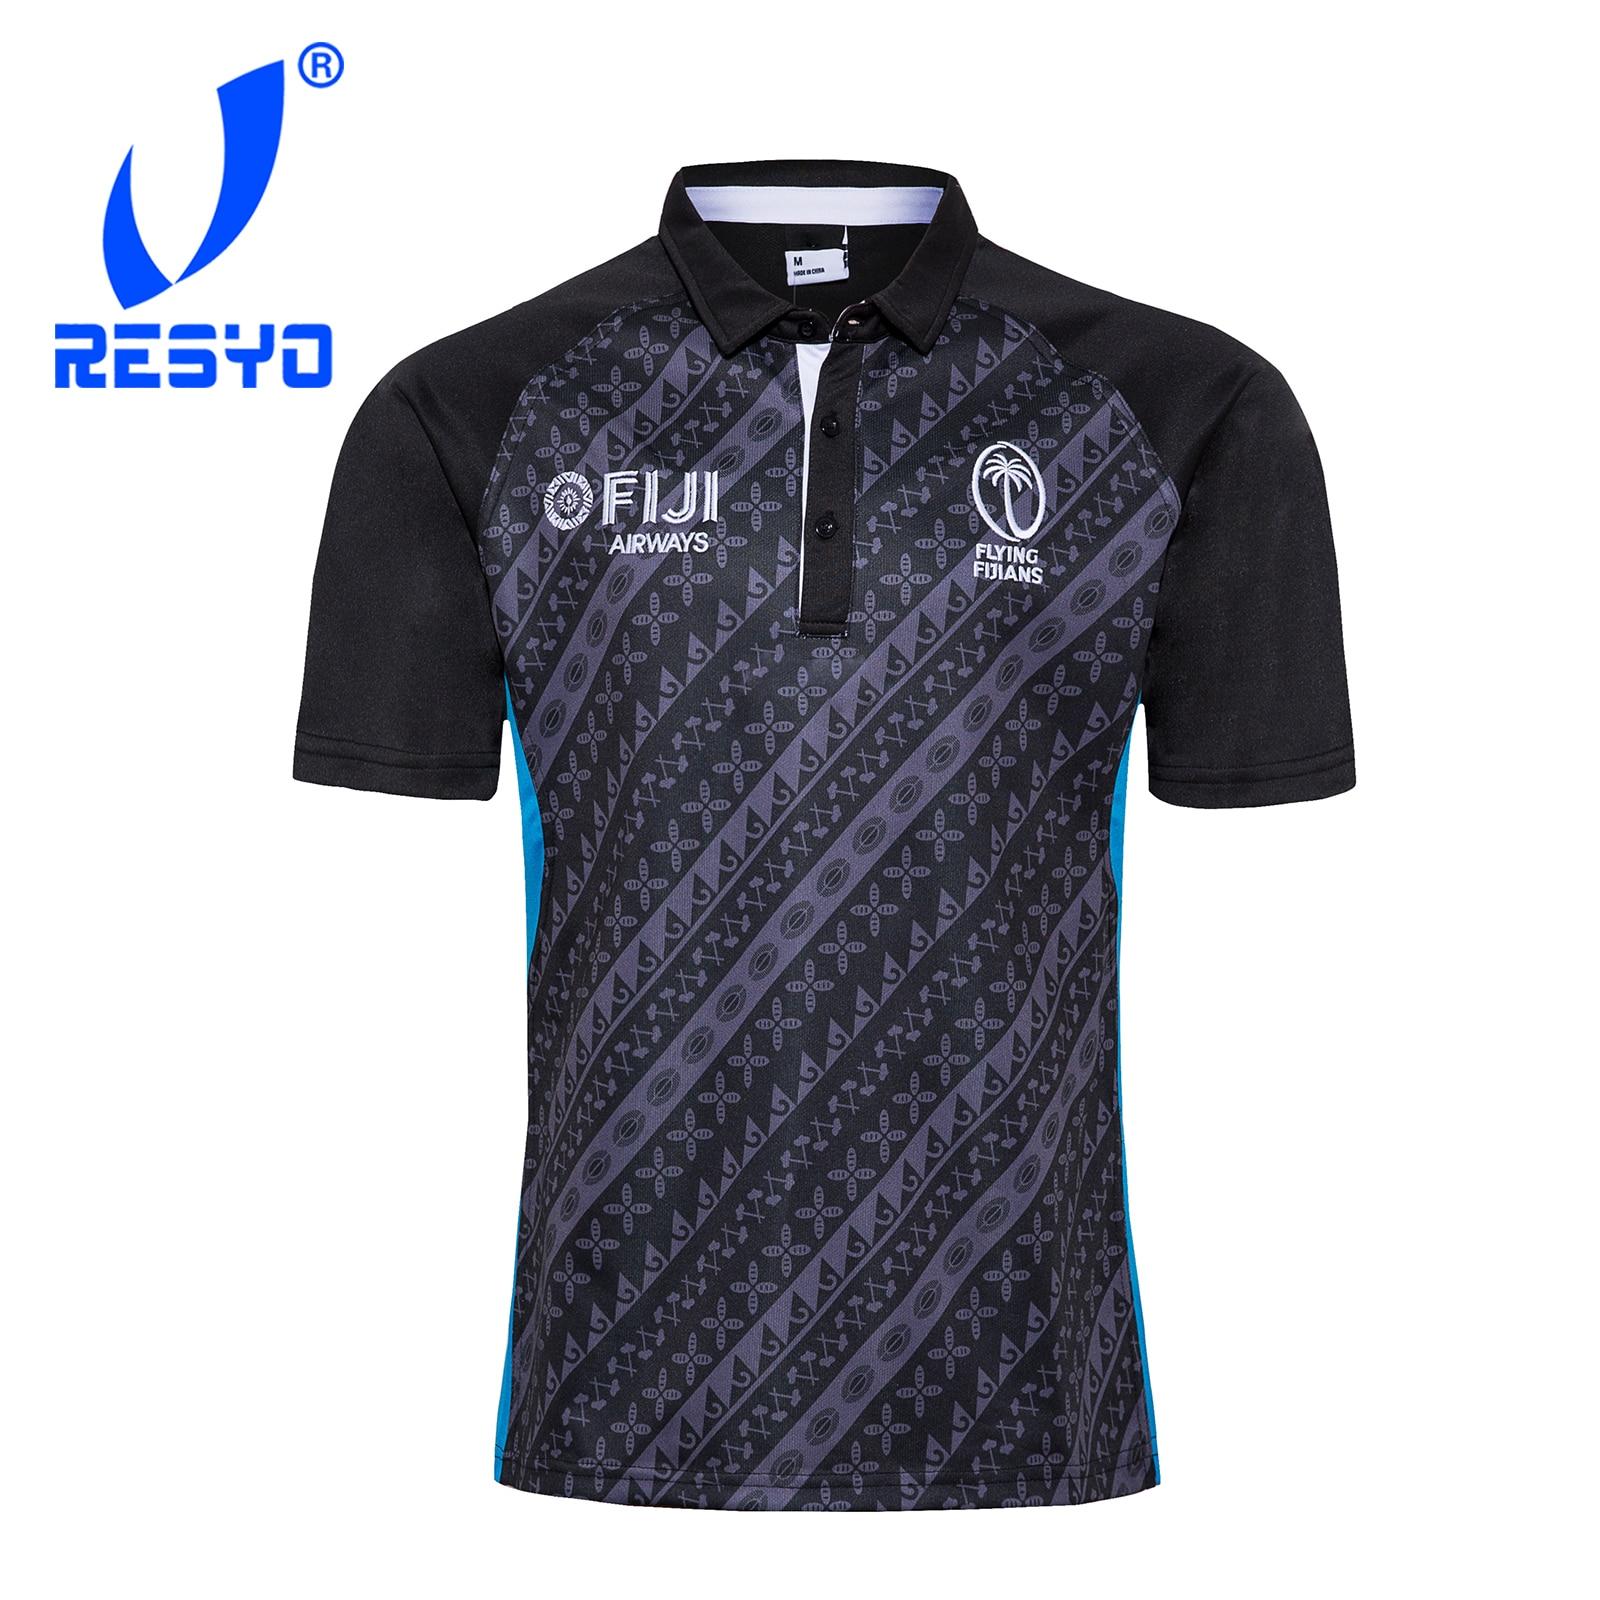 RESYO FÜR 2020 FIDSCHI Souvenir Edition MÄNNER Rugby Jersey Sport Hemd S-3XL